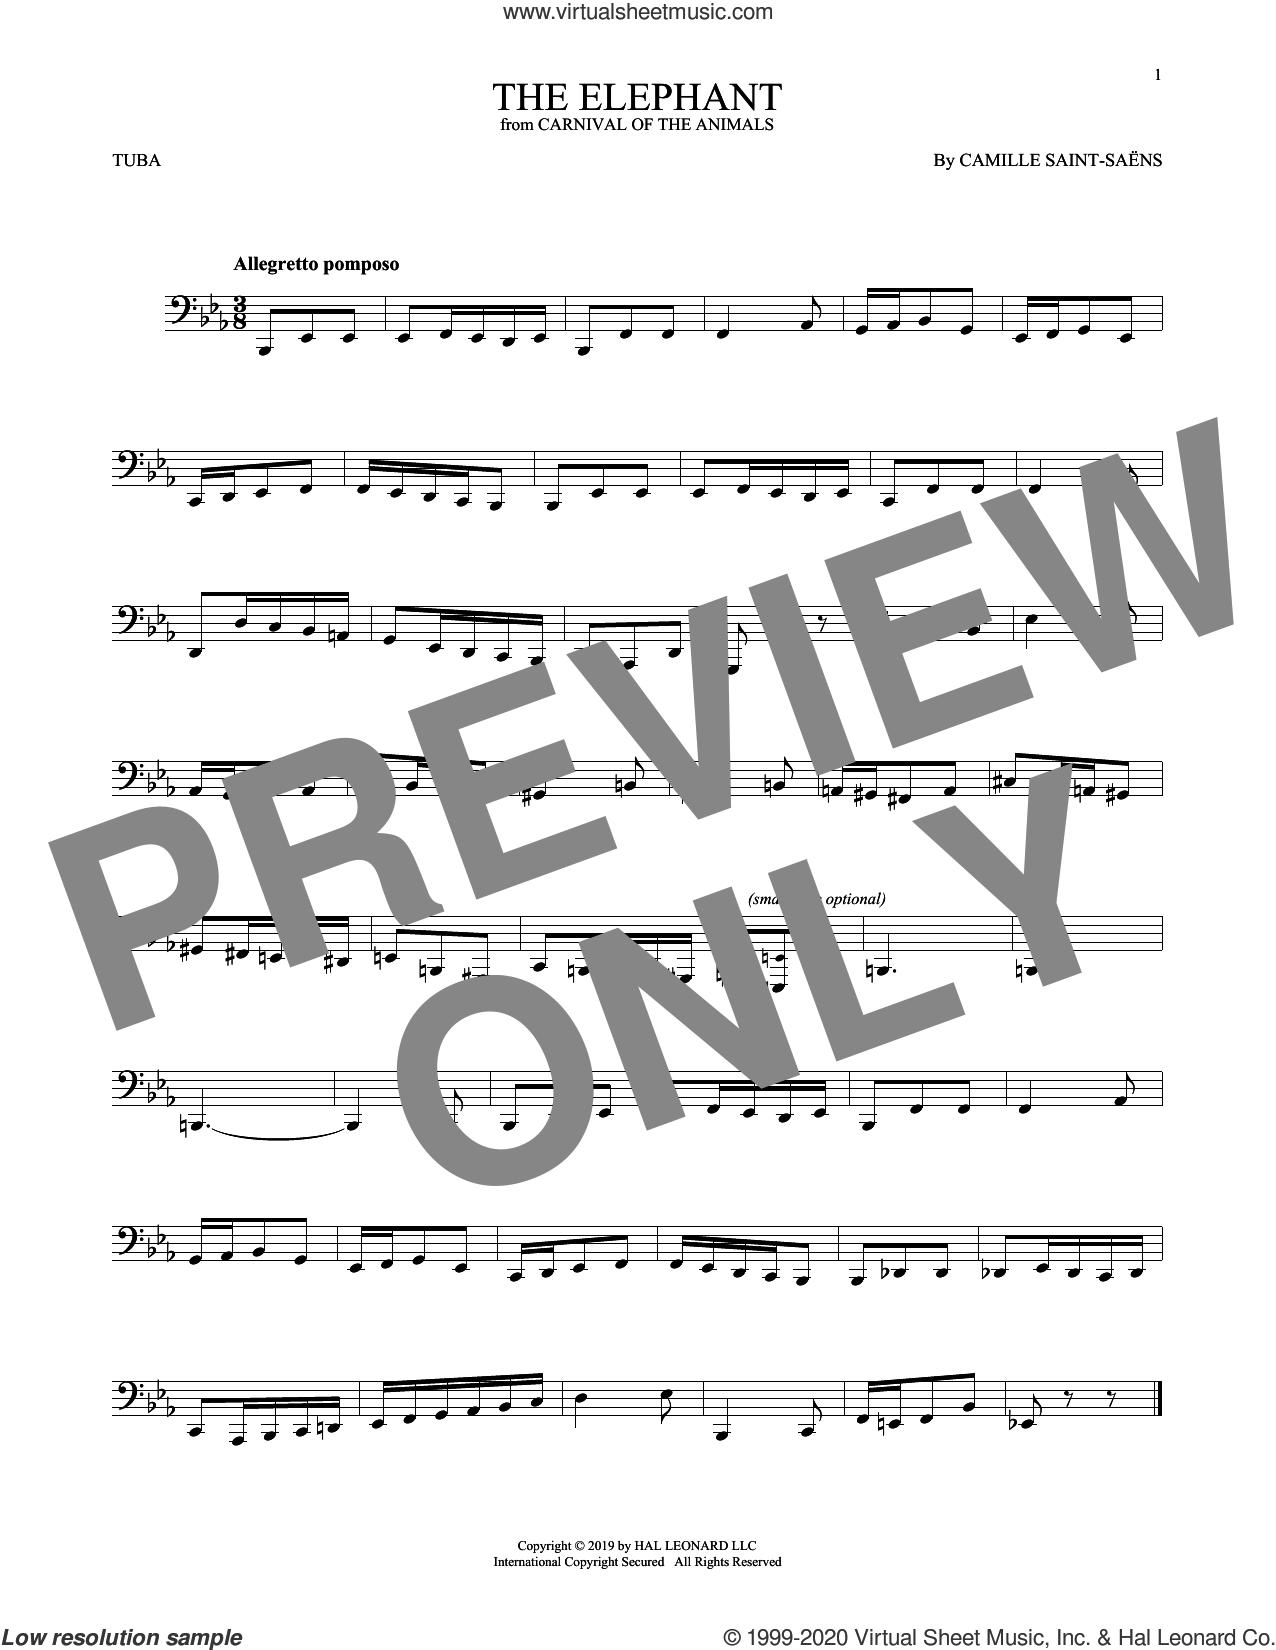 The Elephant sheet music for Tuba Solo (tuba) by Camille Saint-Saens, classical score, intermediate skill level